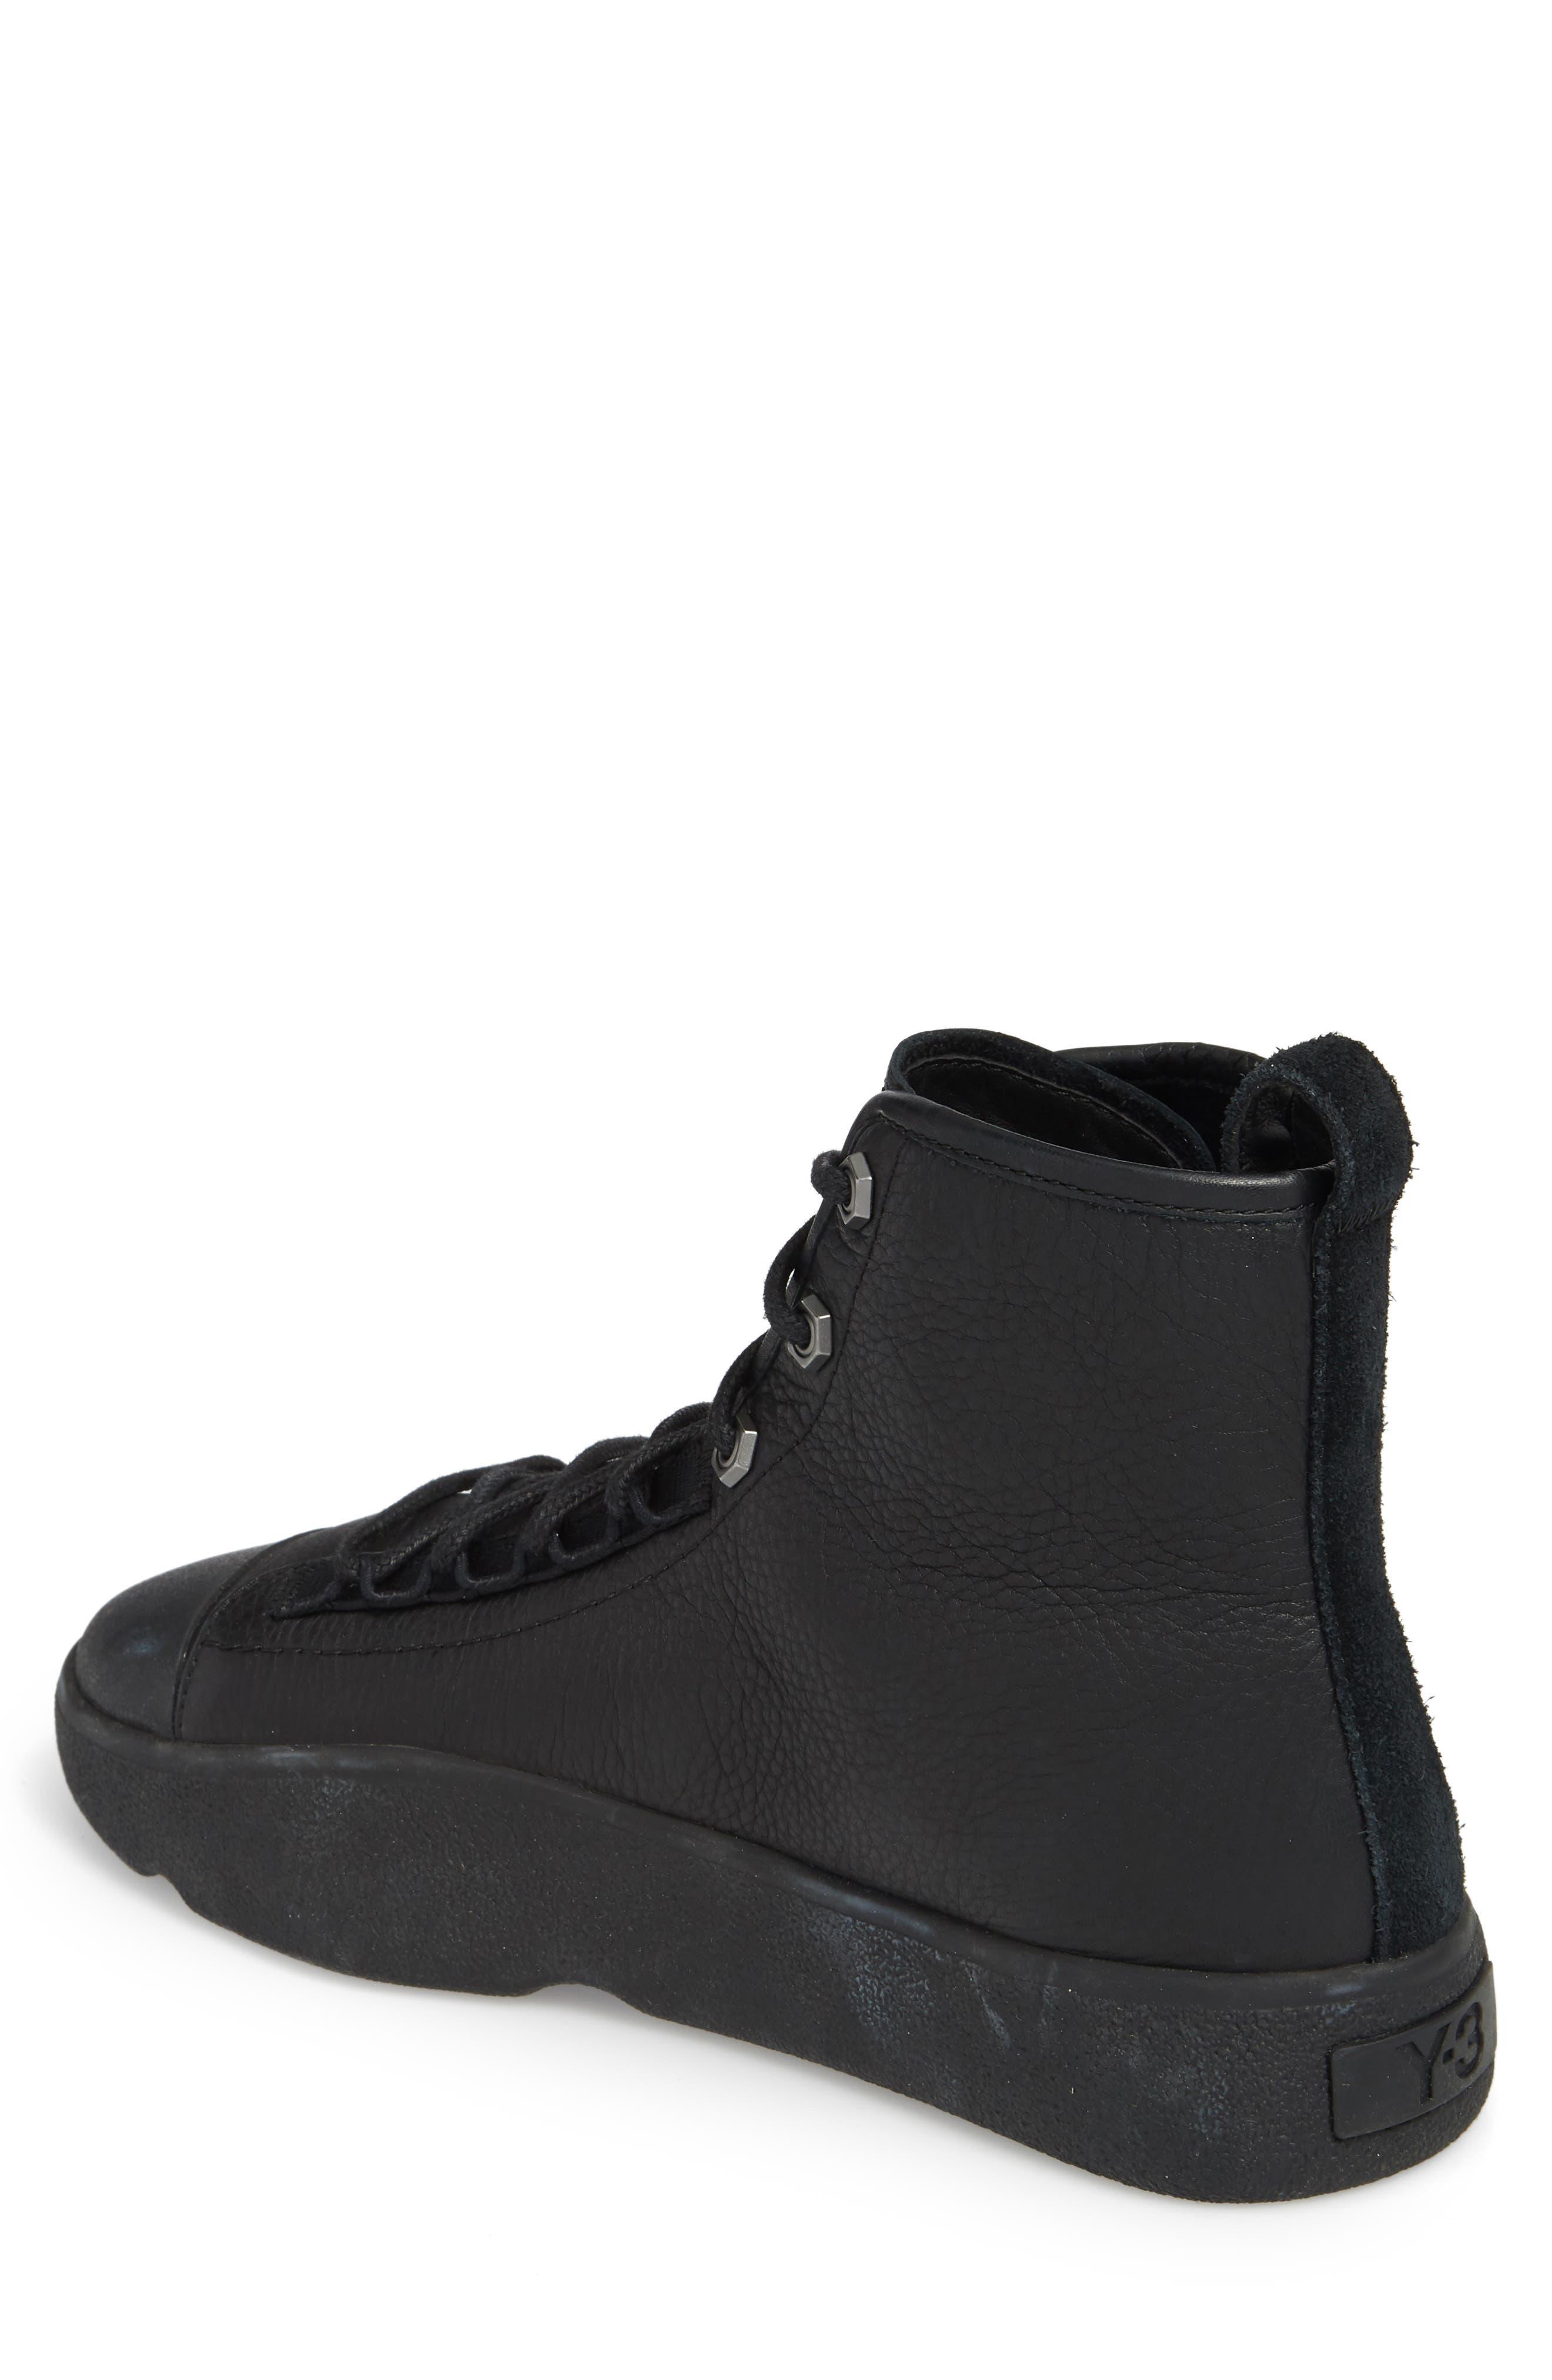 x adidas Bashyo High Top Sneaker,                             Alternate thumbnail 2, color,                             BLACK/BLACK